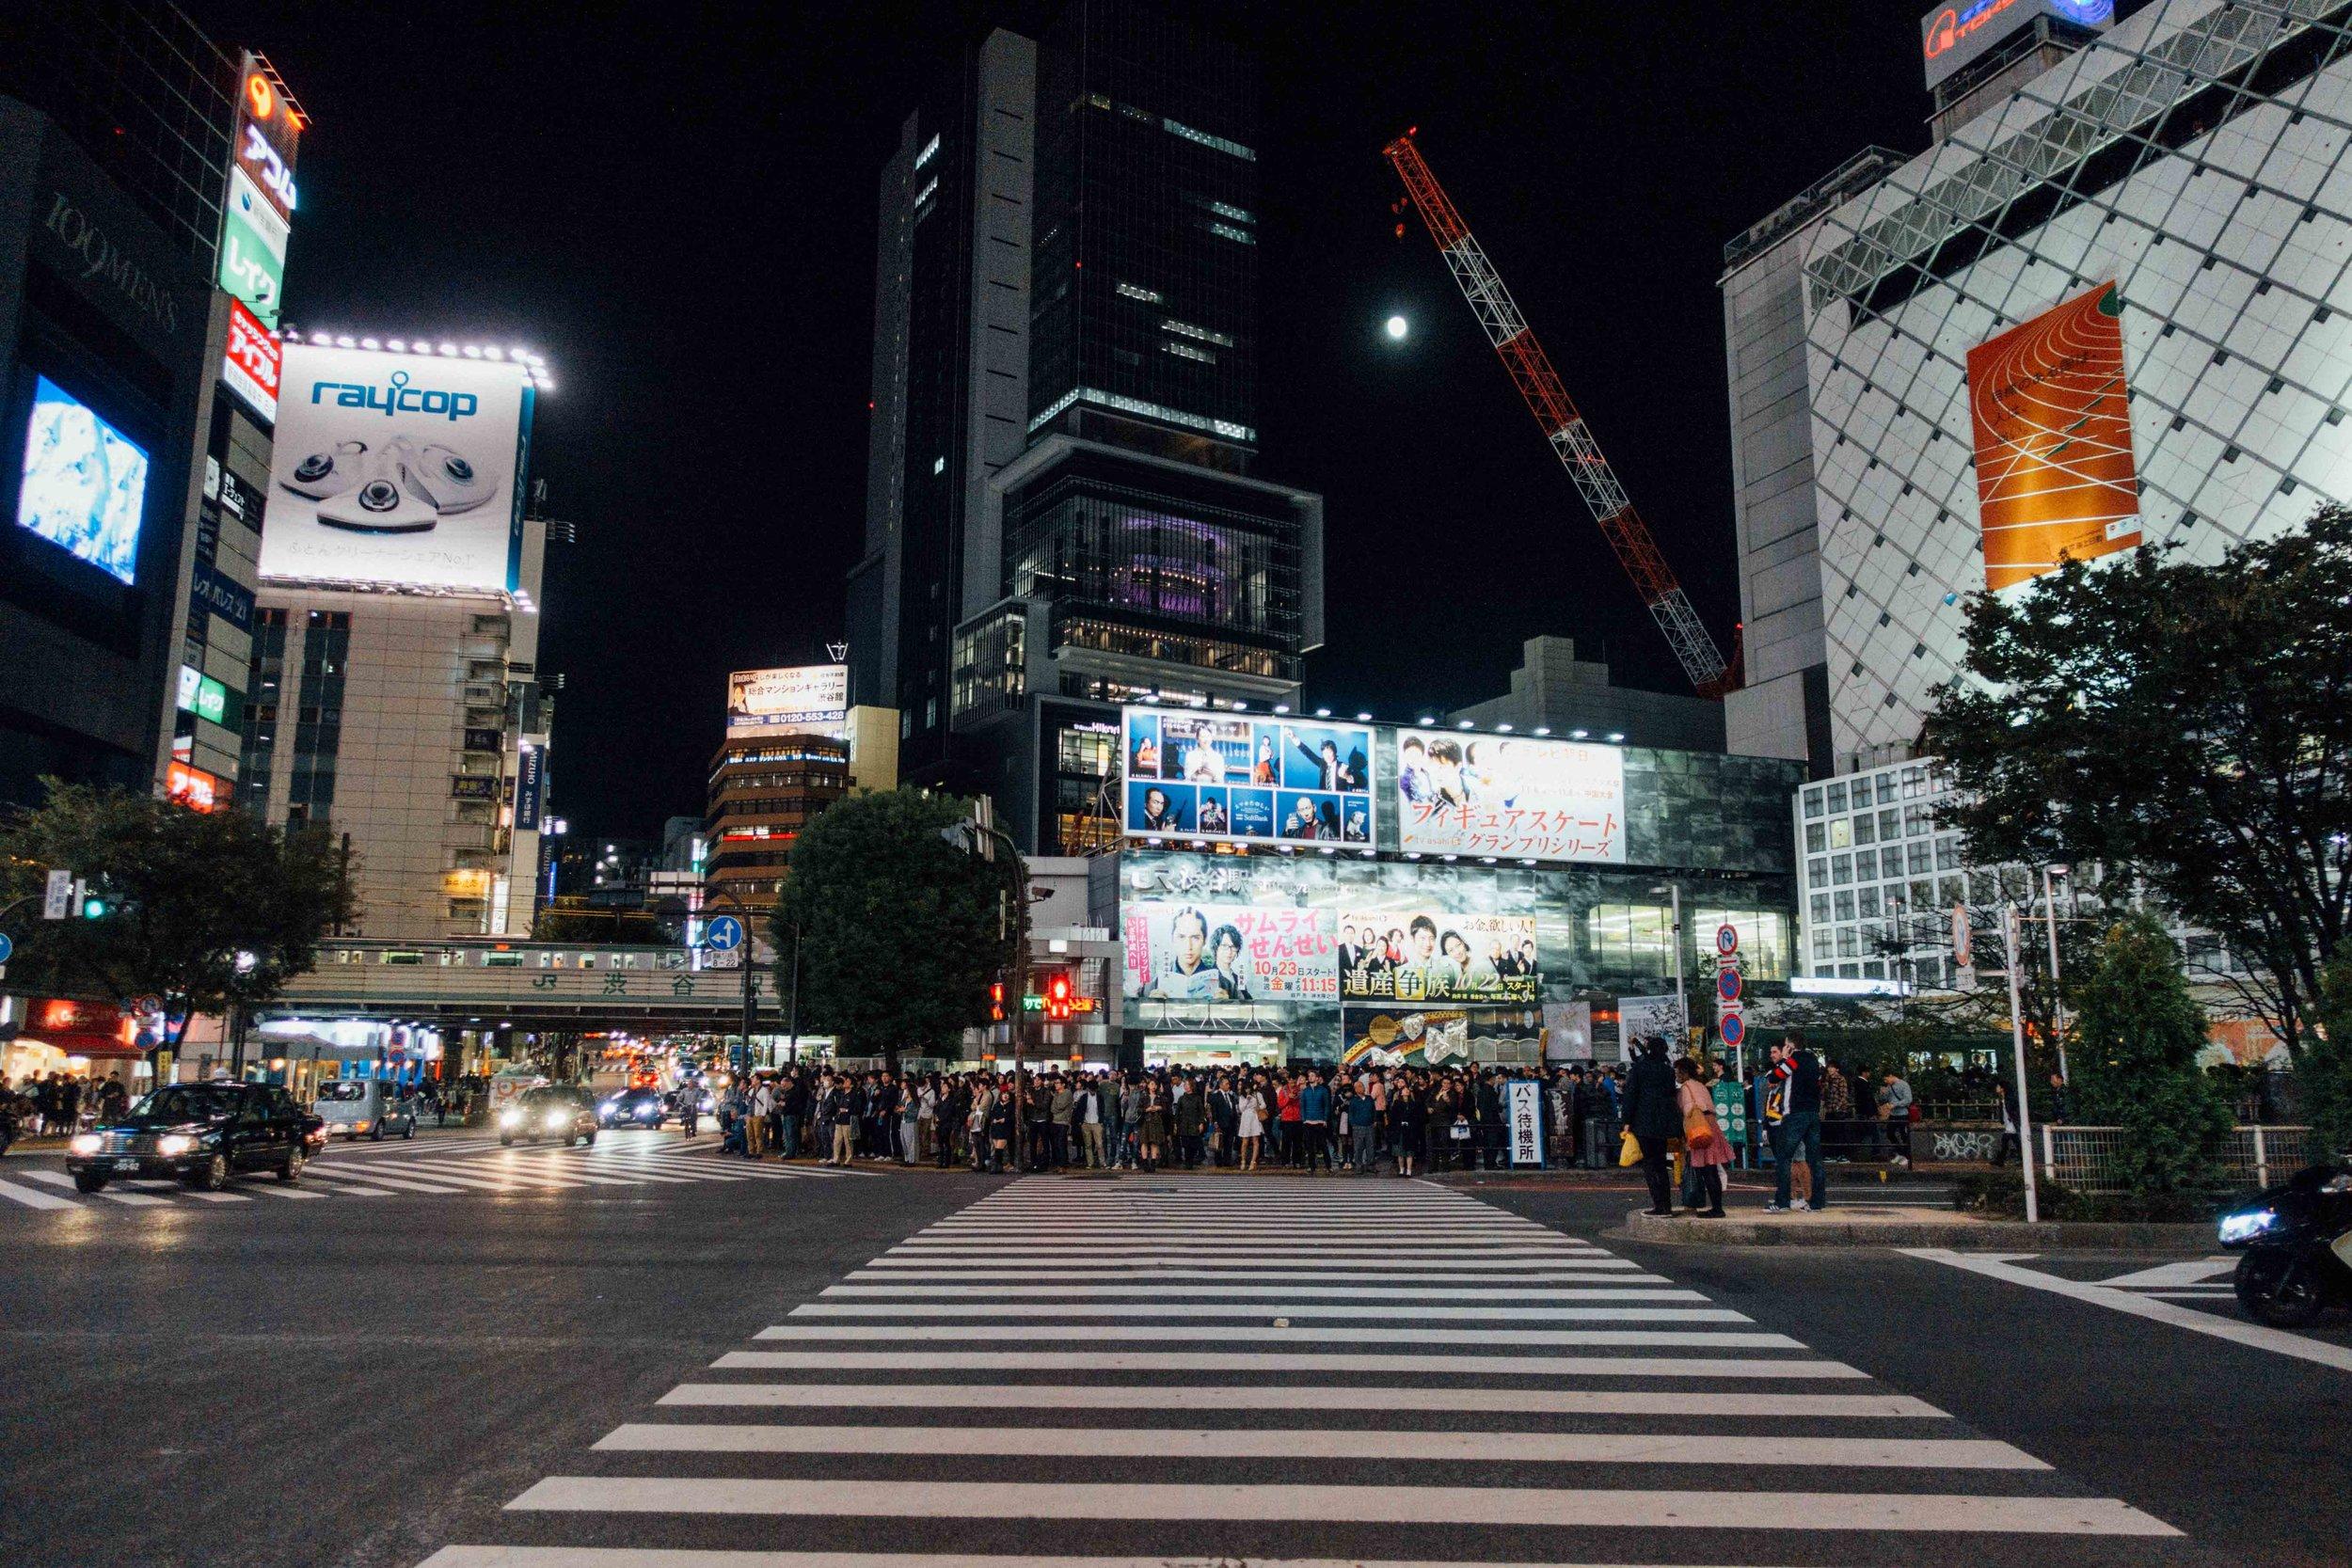 sony-rx100-mk3-street-photography